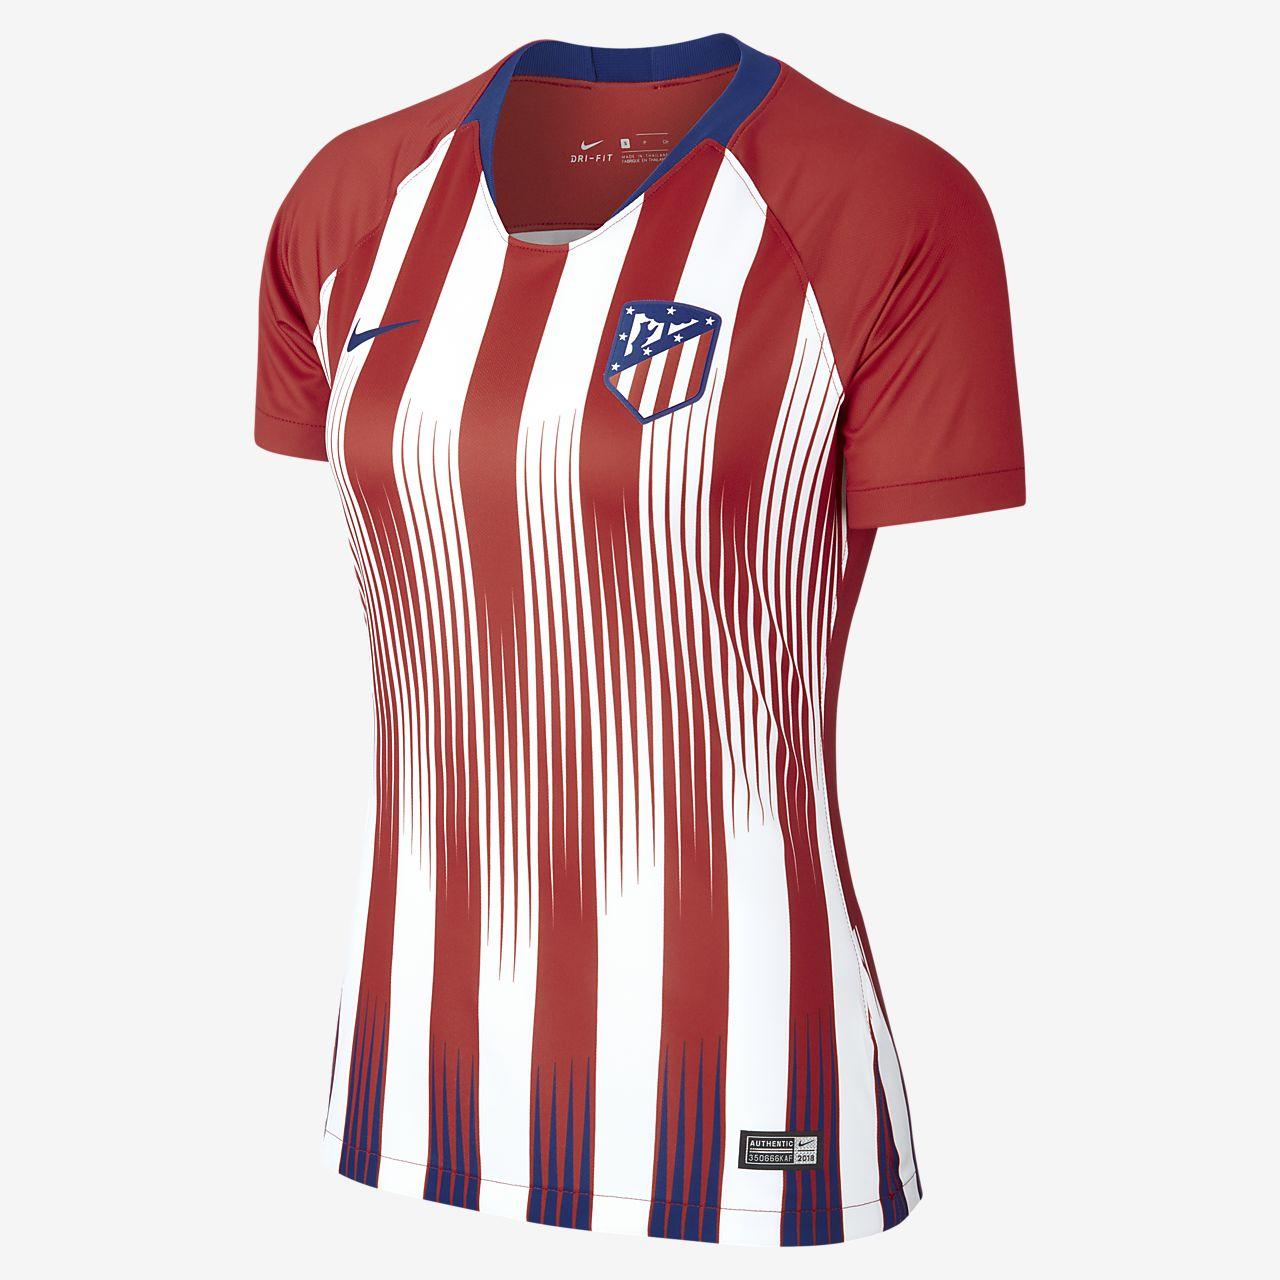 vetement Atlético de Madrid 2018